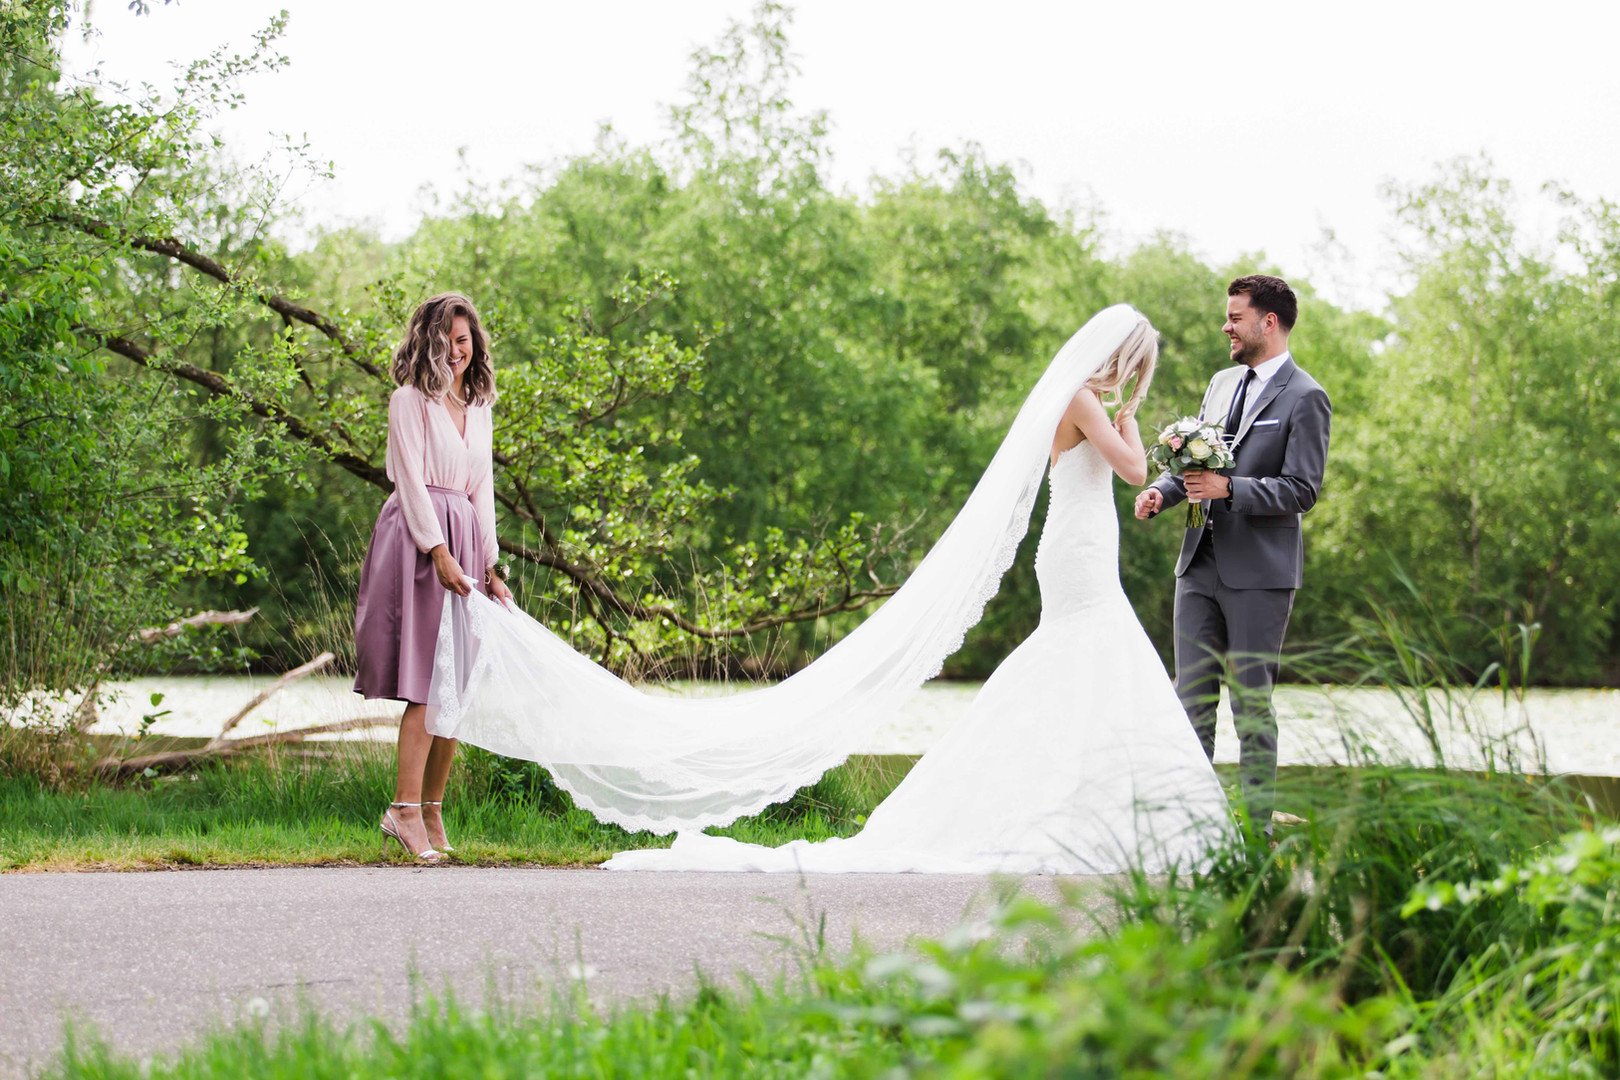 H58_Wedding couple.jpg